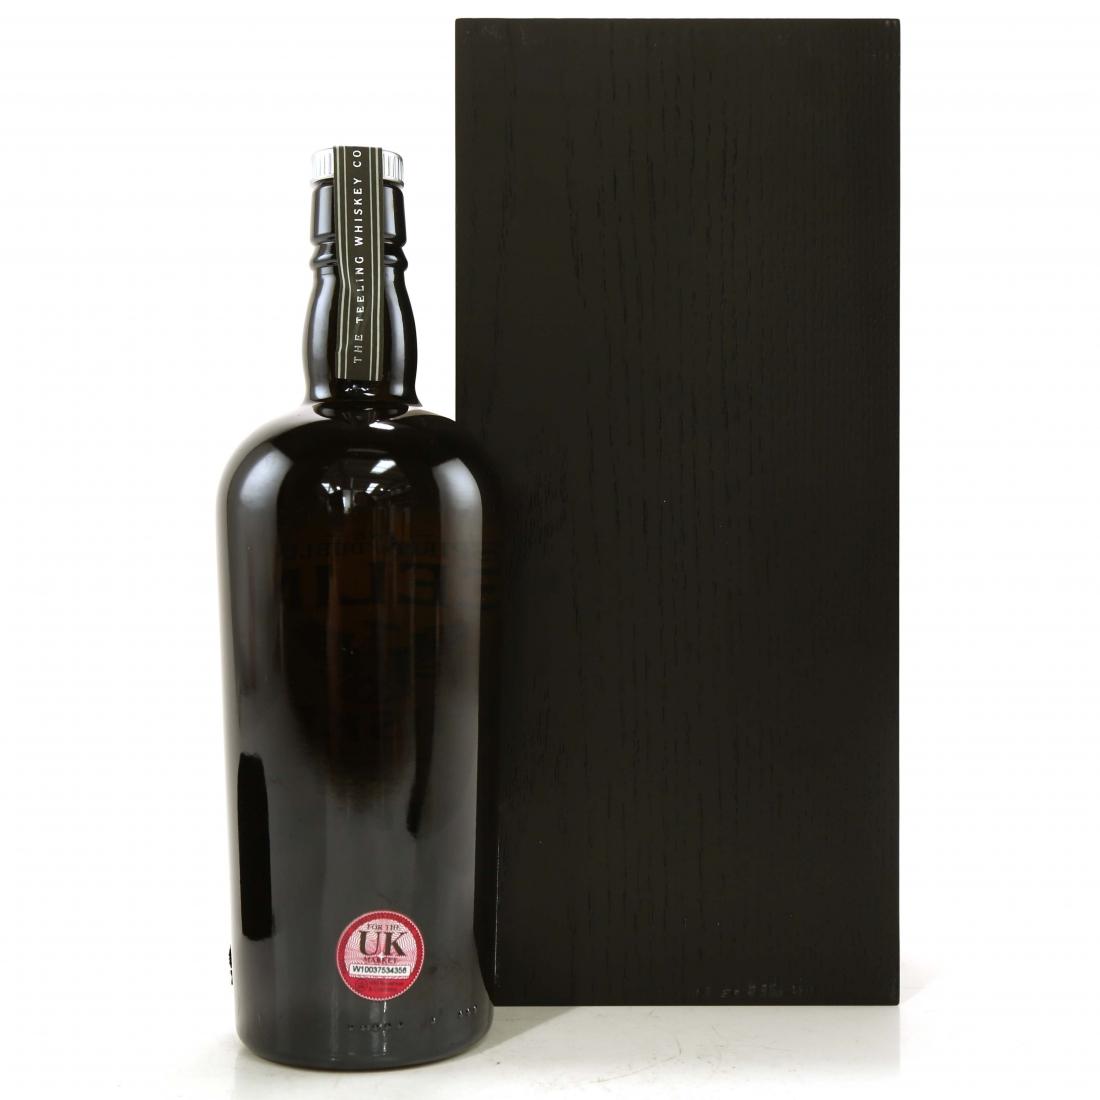 Teeling Celebratory Single Pot Still Whiskey / Bottle #069